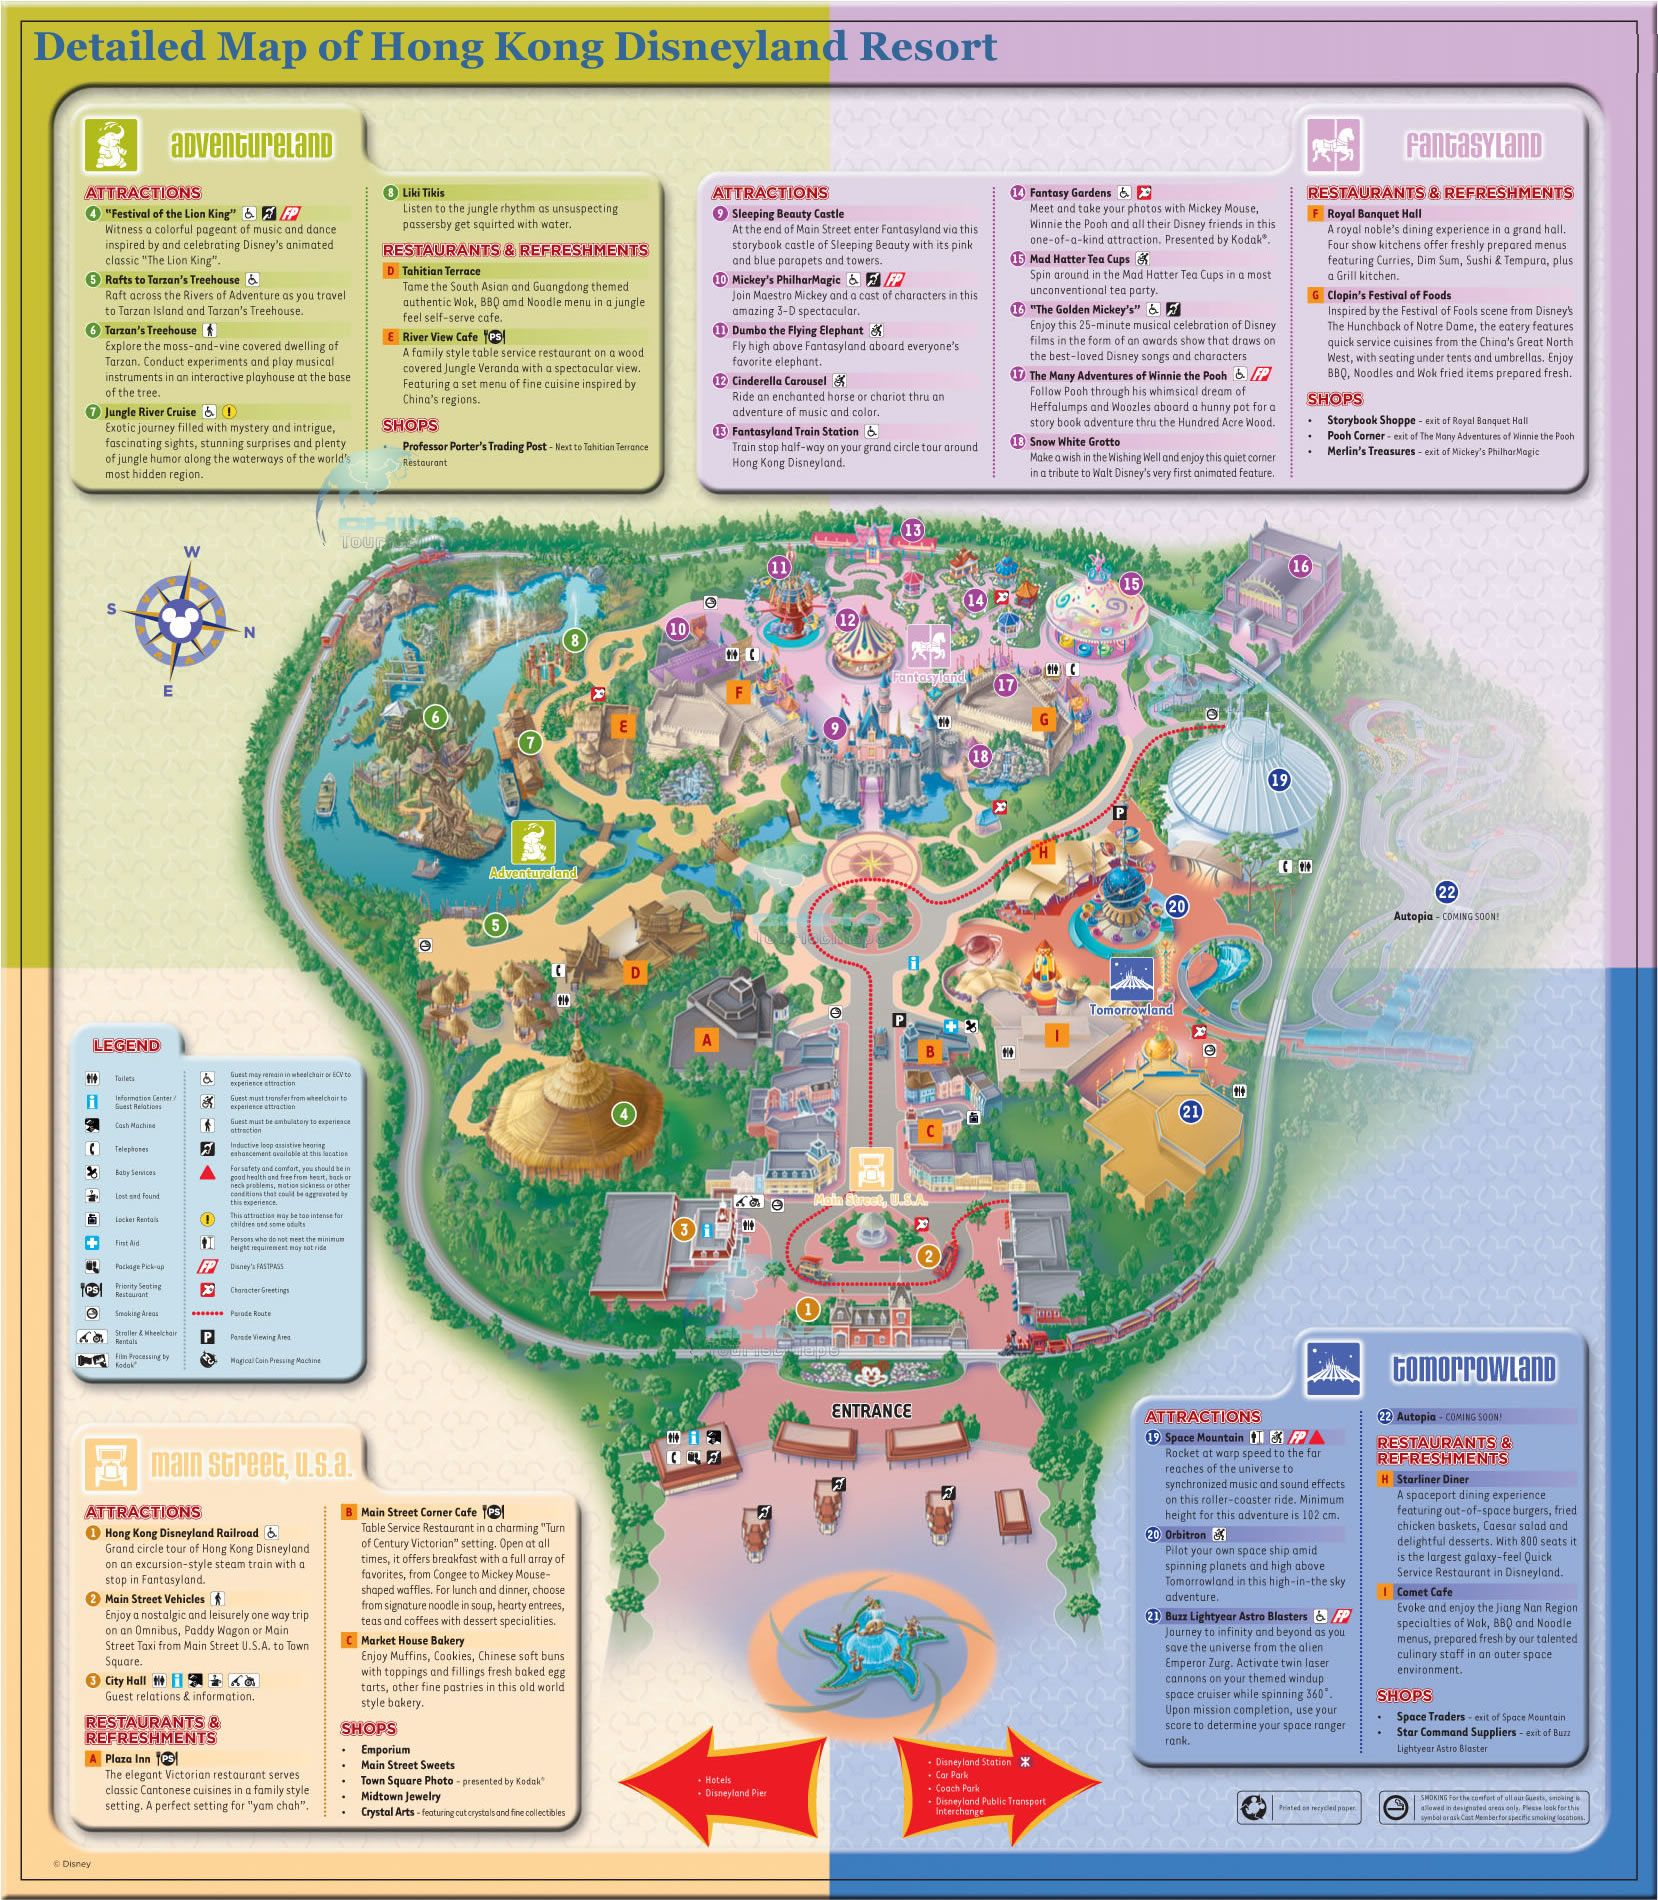 Singapore To Hong Kong Disneyland By Train Travel Top - Disneyland brazil map